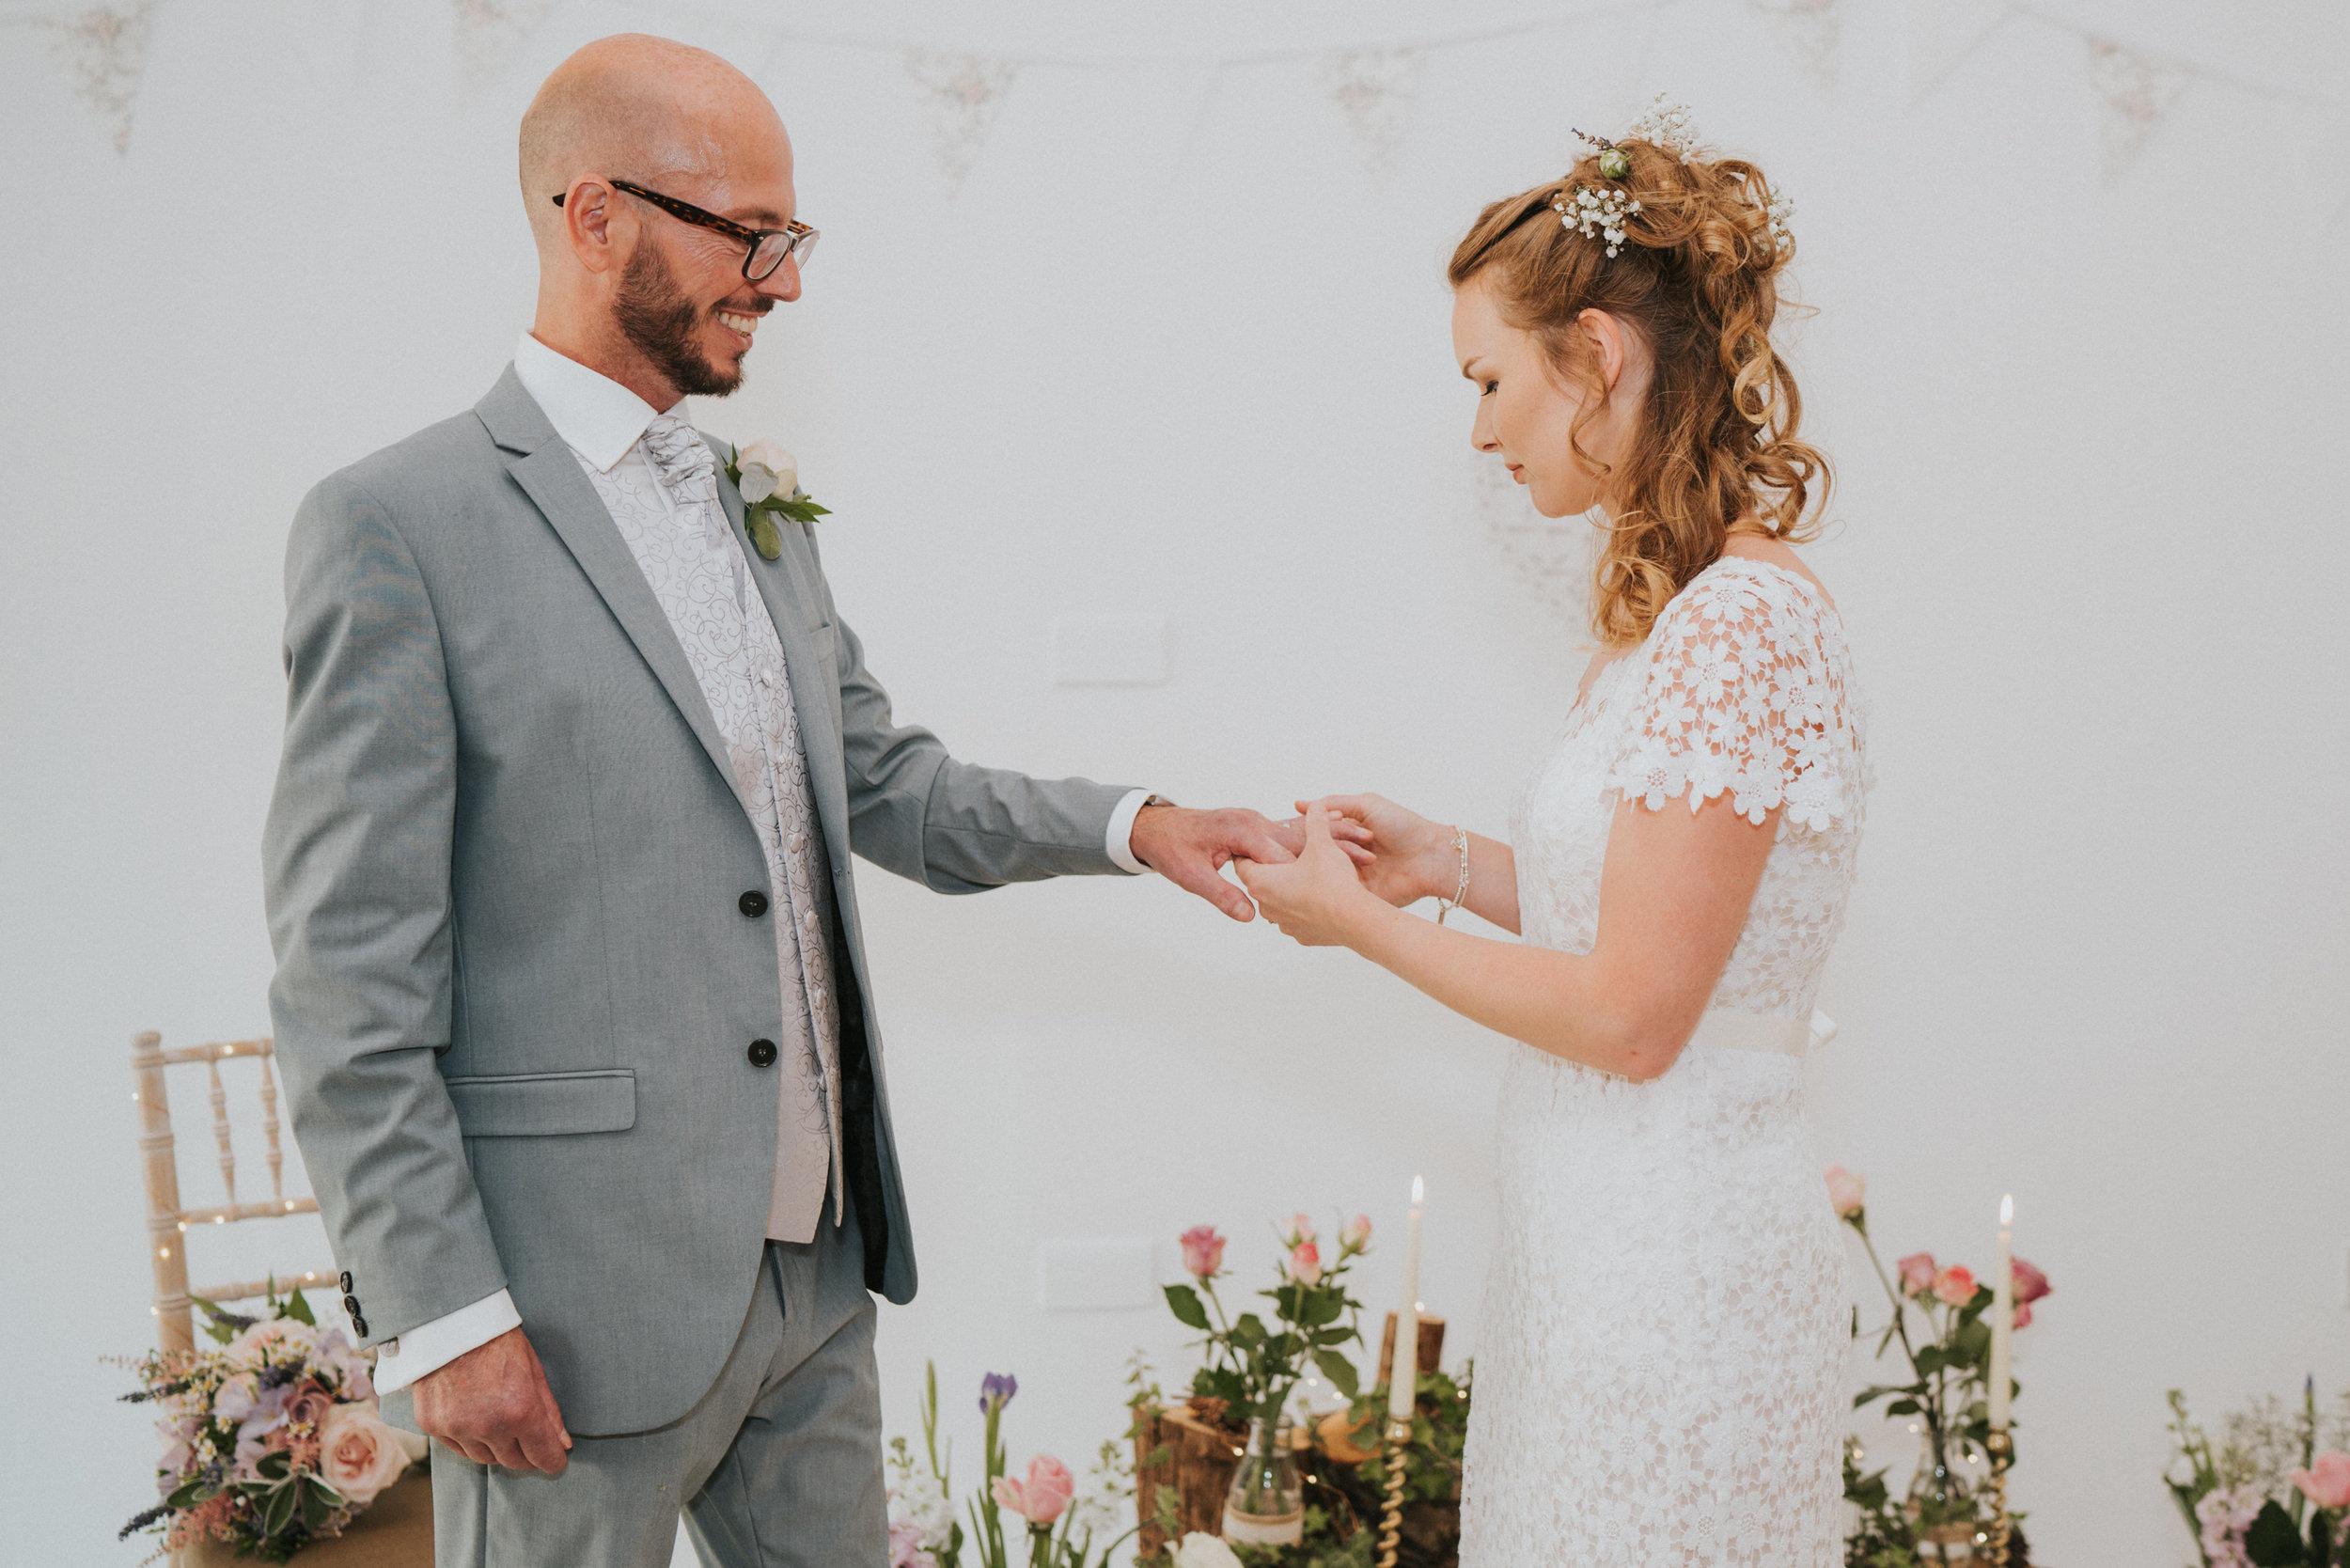 Grace-Elizabeth-Georgie-Amalaketu-Firstsite-Colchester-Essex-Boho-Buddhist-Wedding-Alternative-Wedding-Photography-Essex (62 of 100).jpg